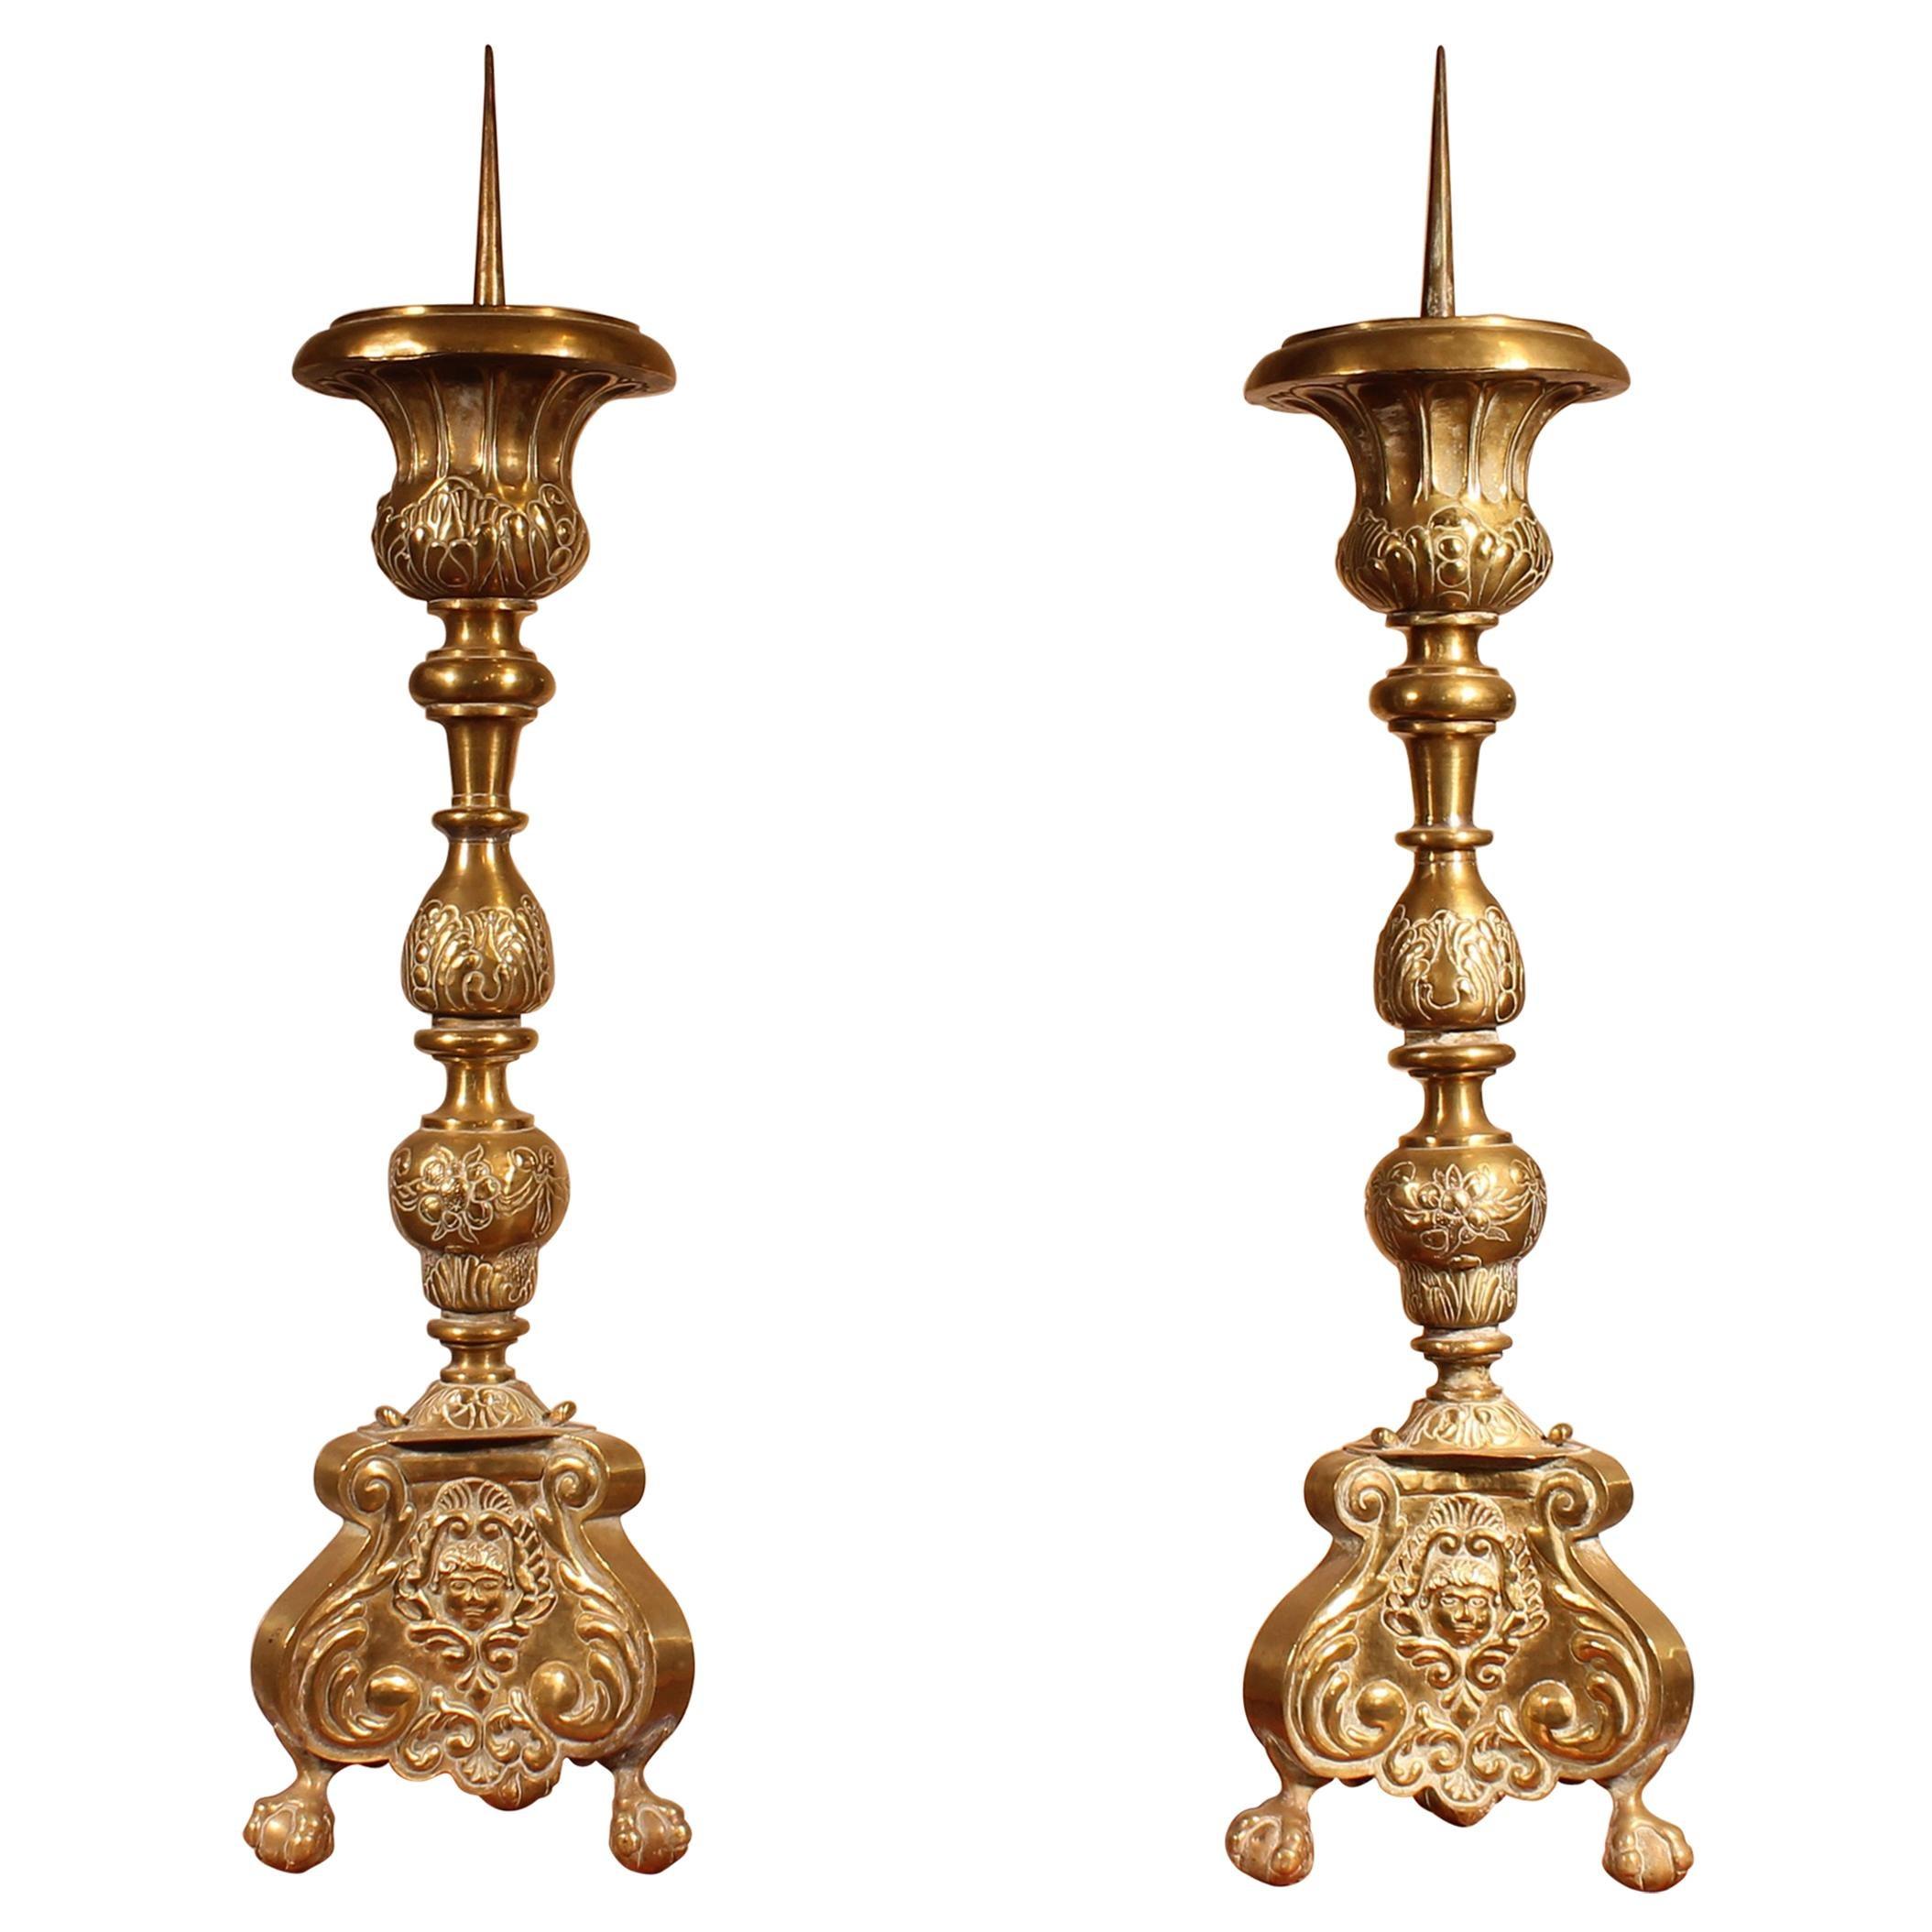 Pair of Louis XV Candlesticks, 18th Century